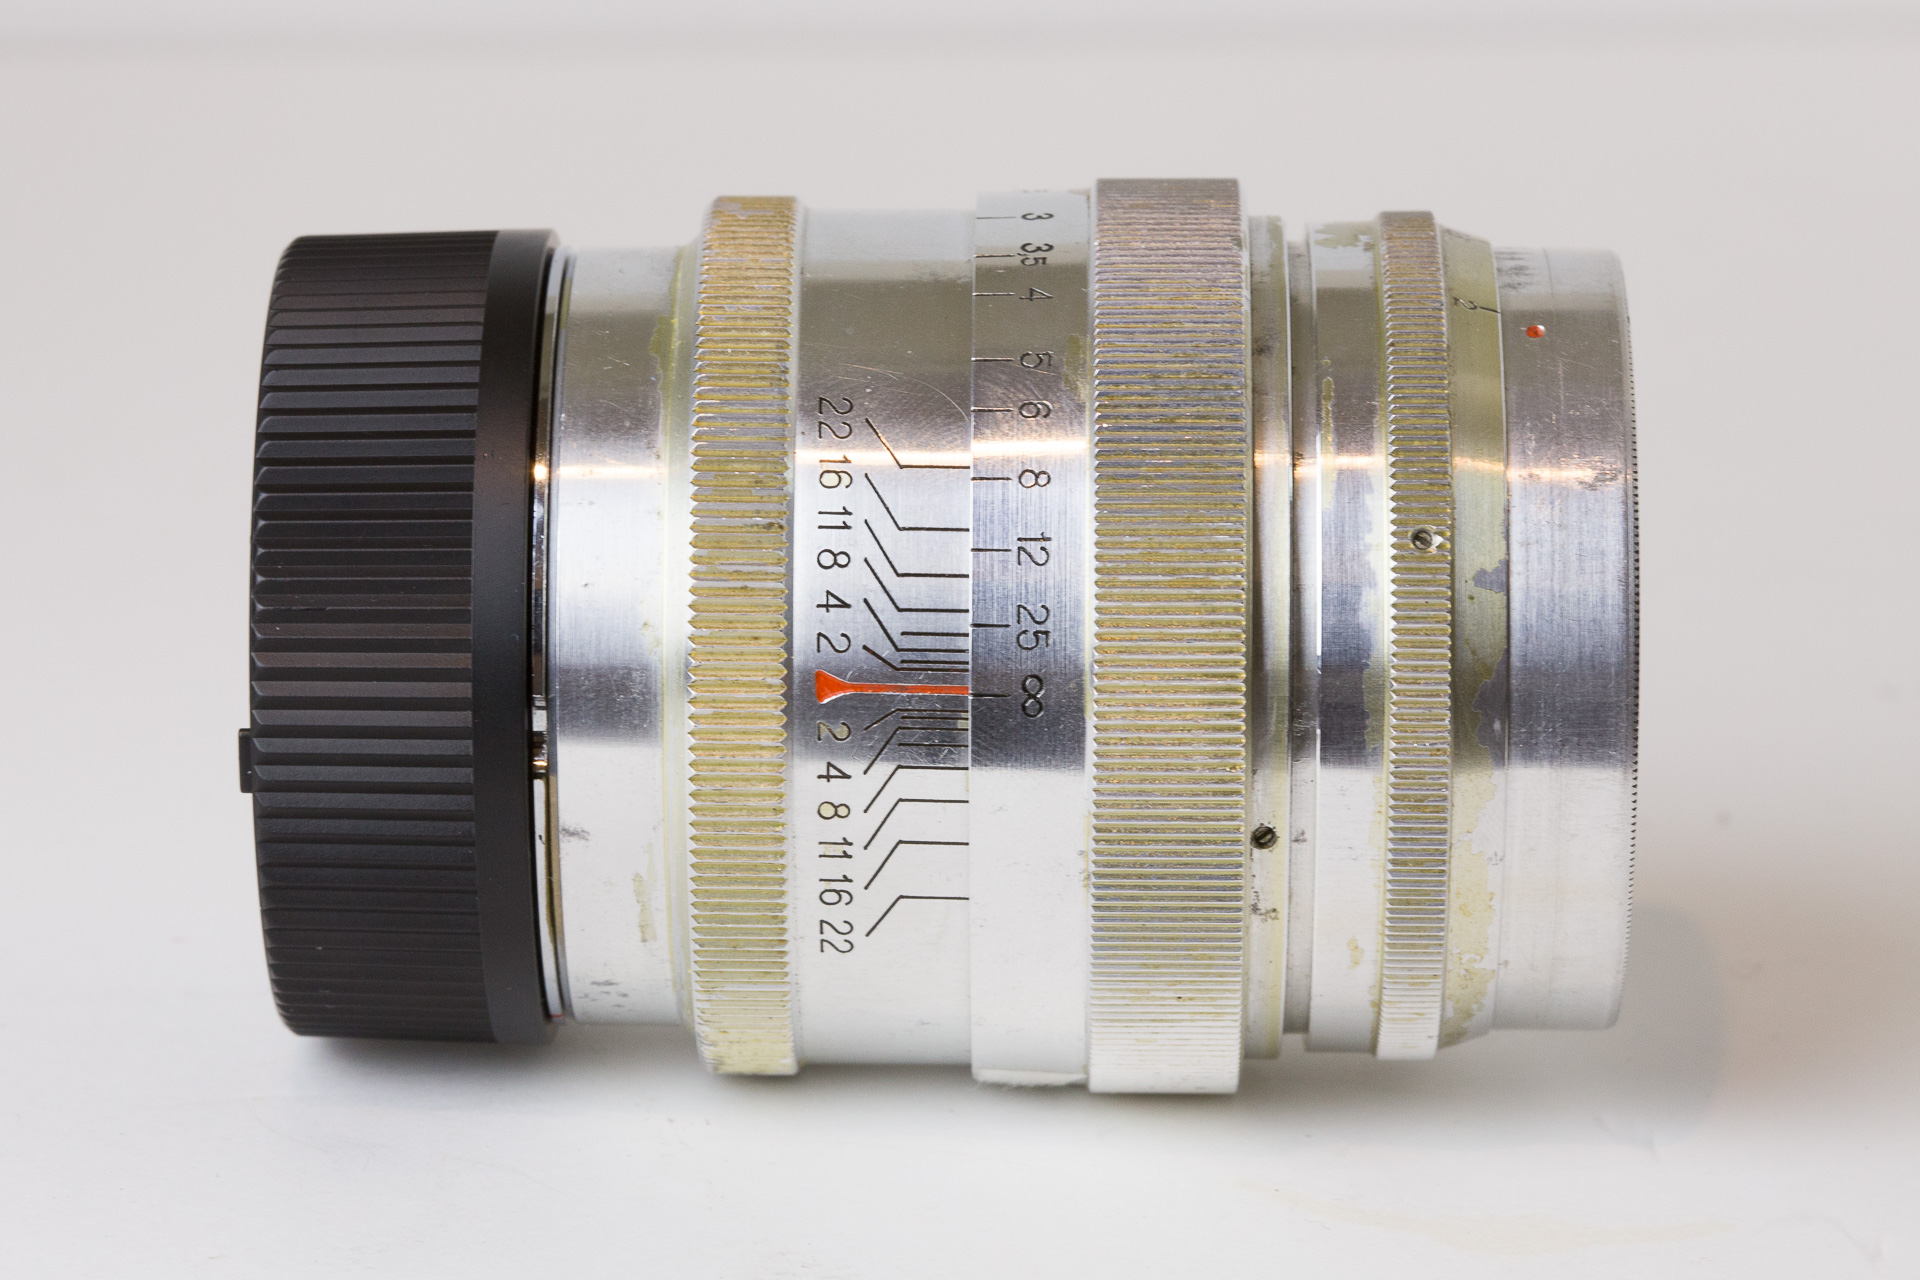 jupiter-9 85mm F2 横 Canon EOS 6D, EF 100mm F2.8 Macro USM